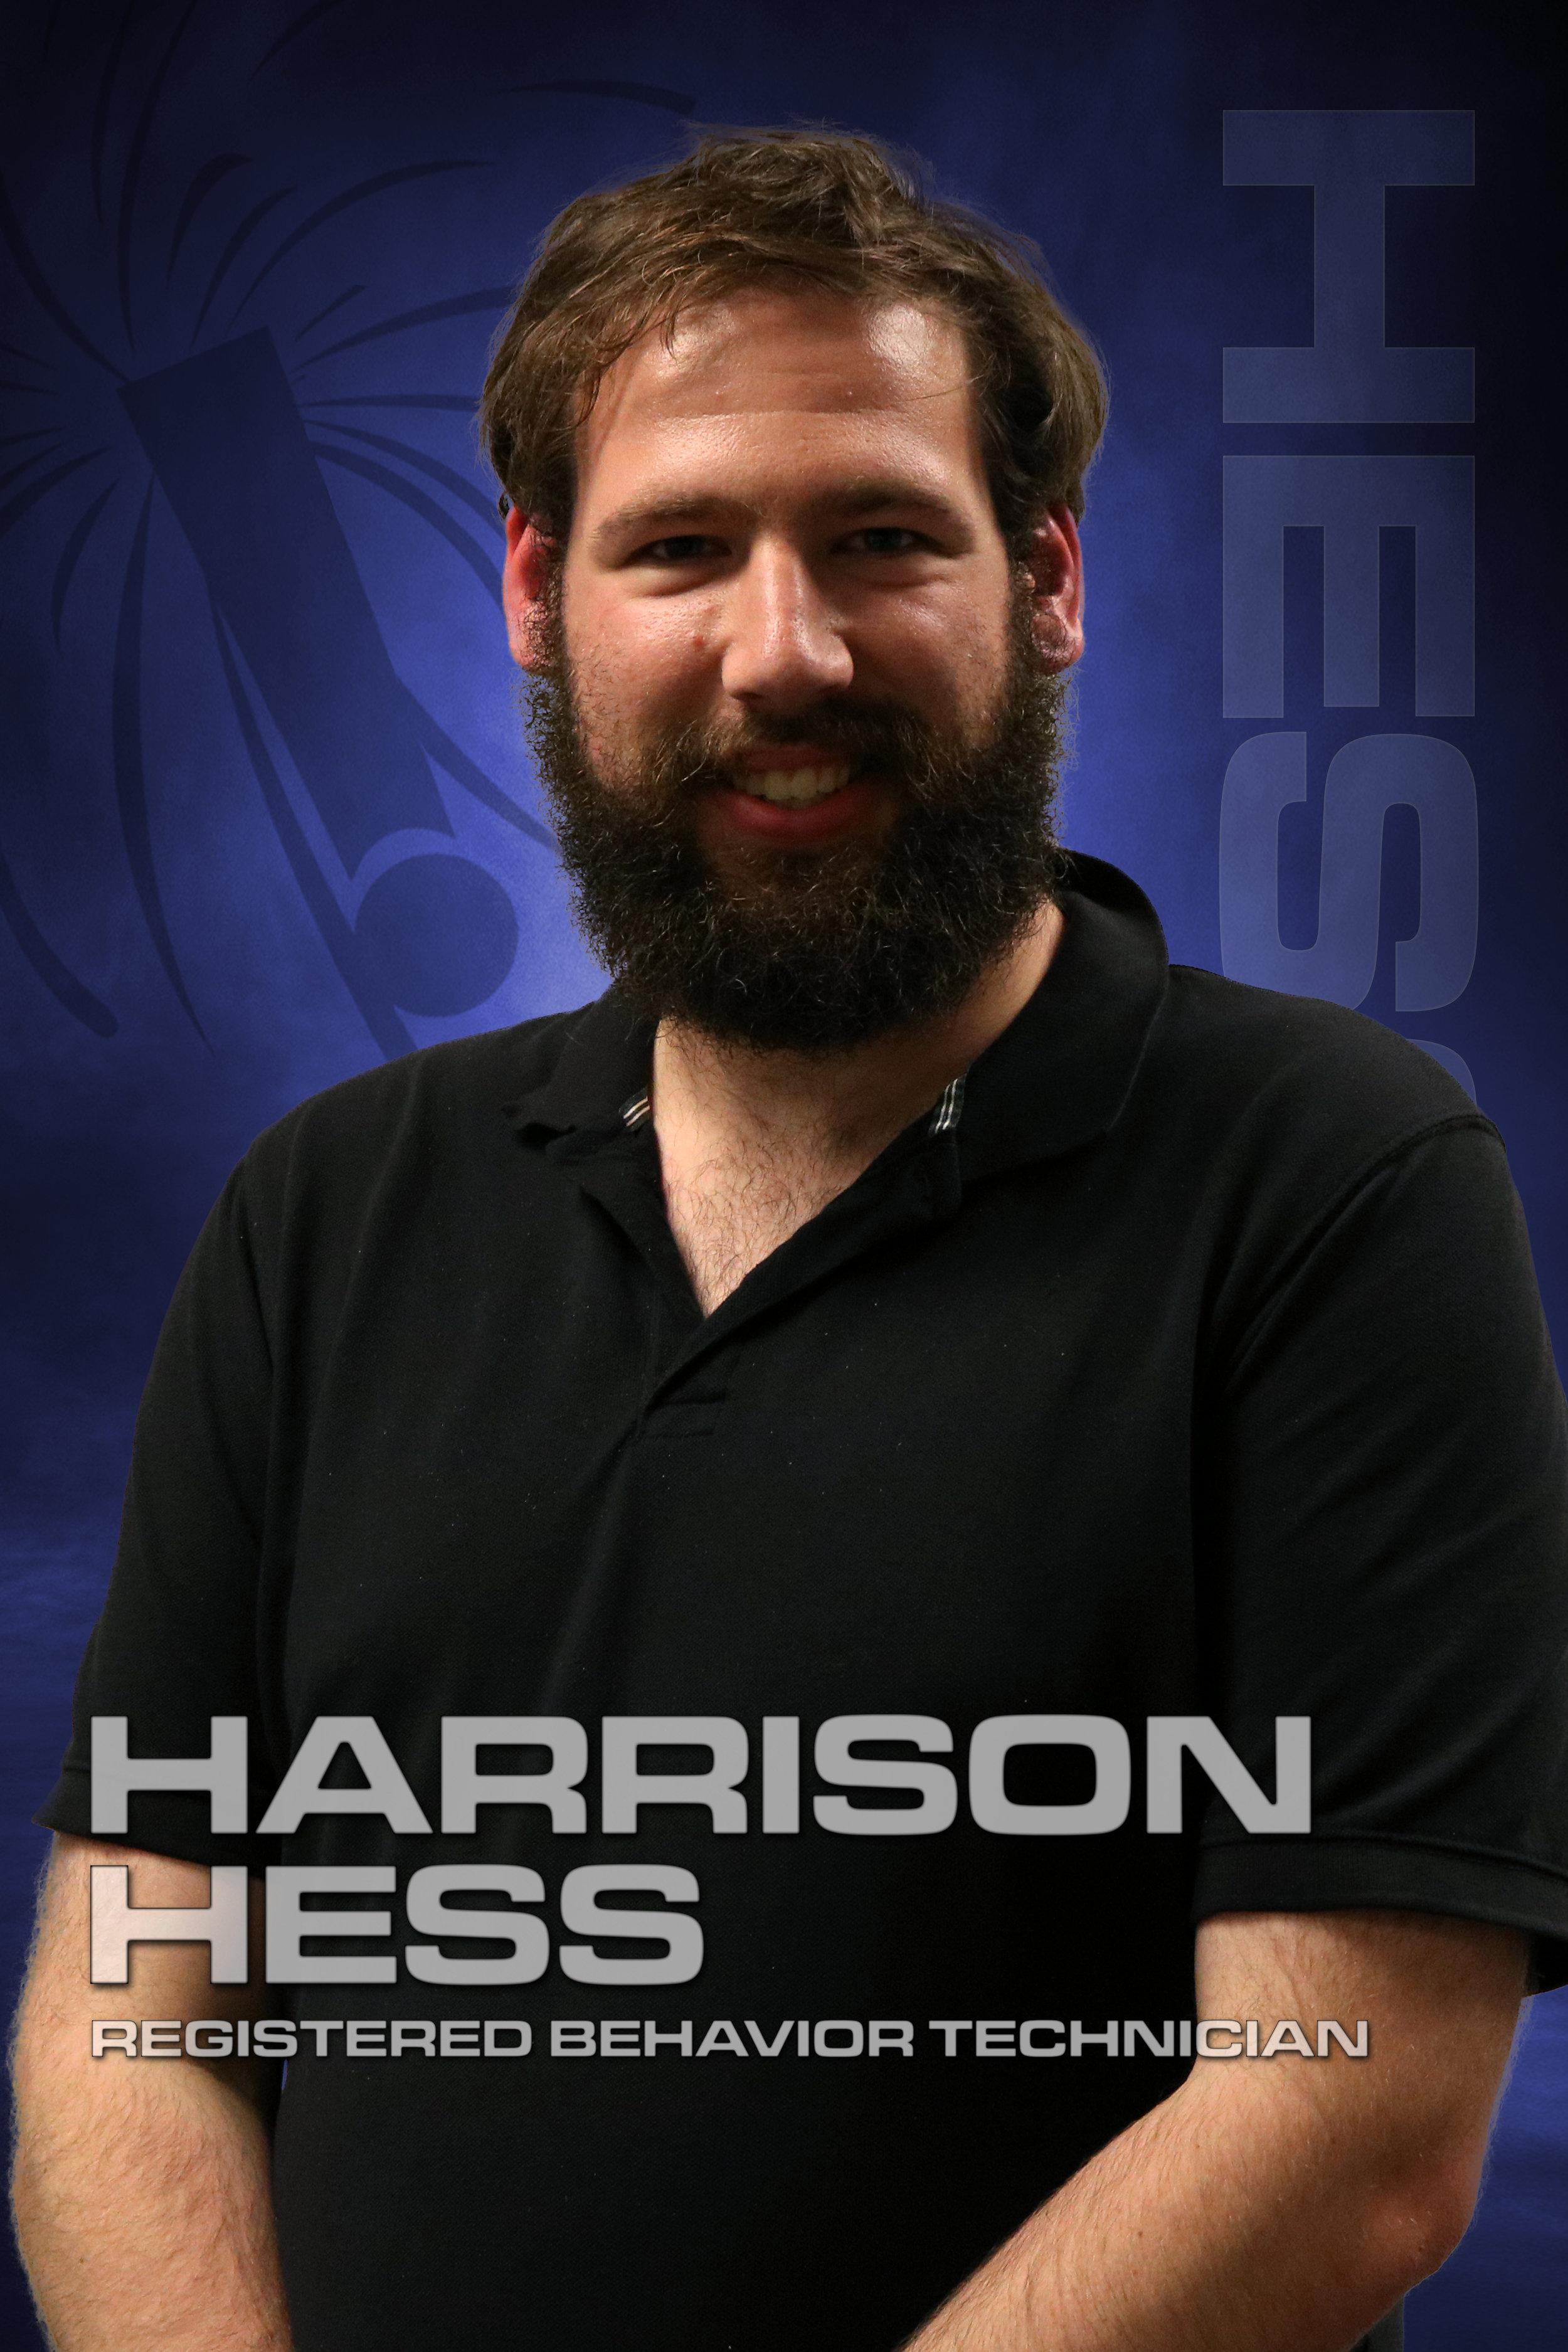 Harrison_poster_12x18.jpg